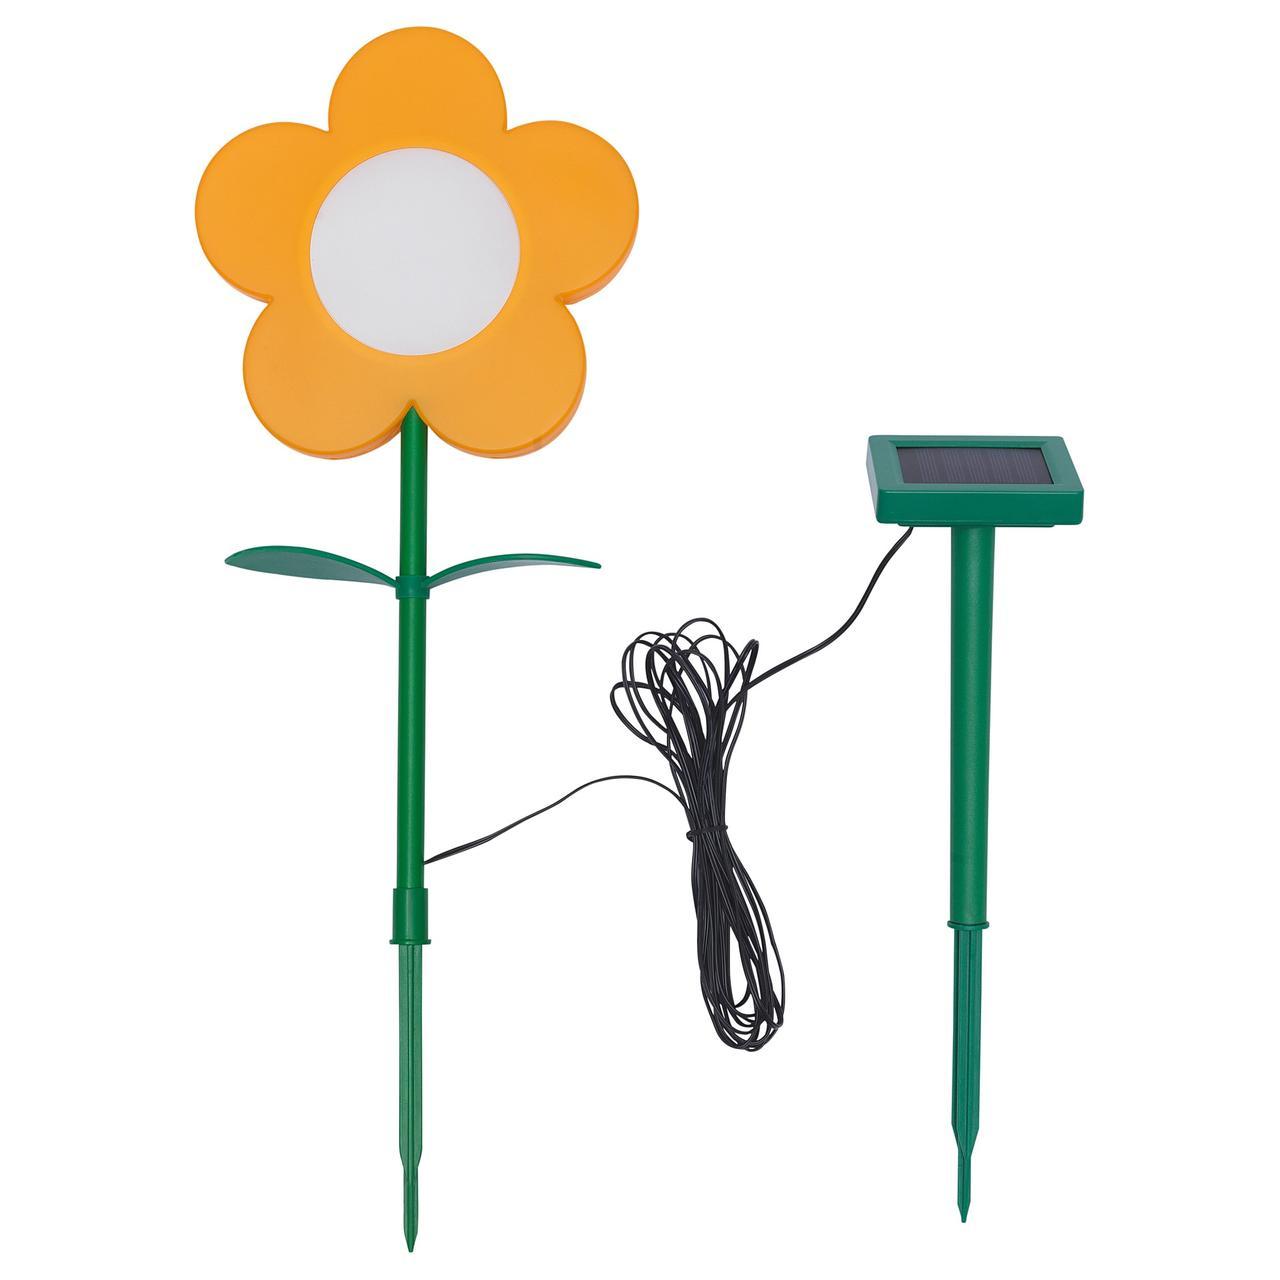 СОЛВИДЕН Подсветка н/солн батарее,светодиод, для сада, цветок желтый